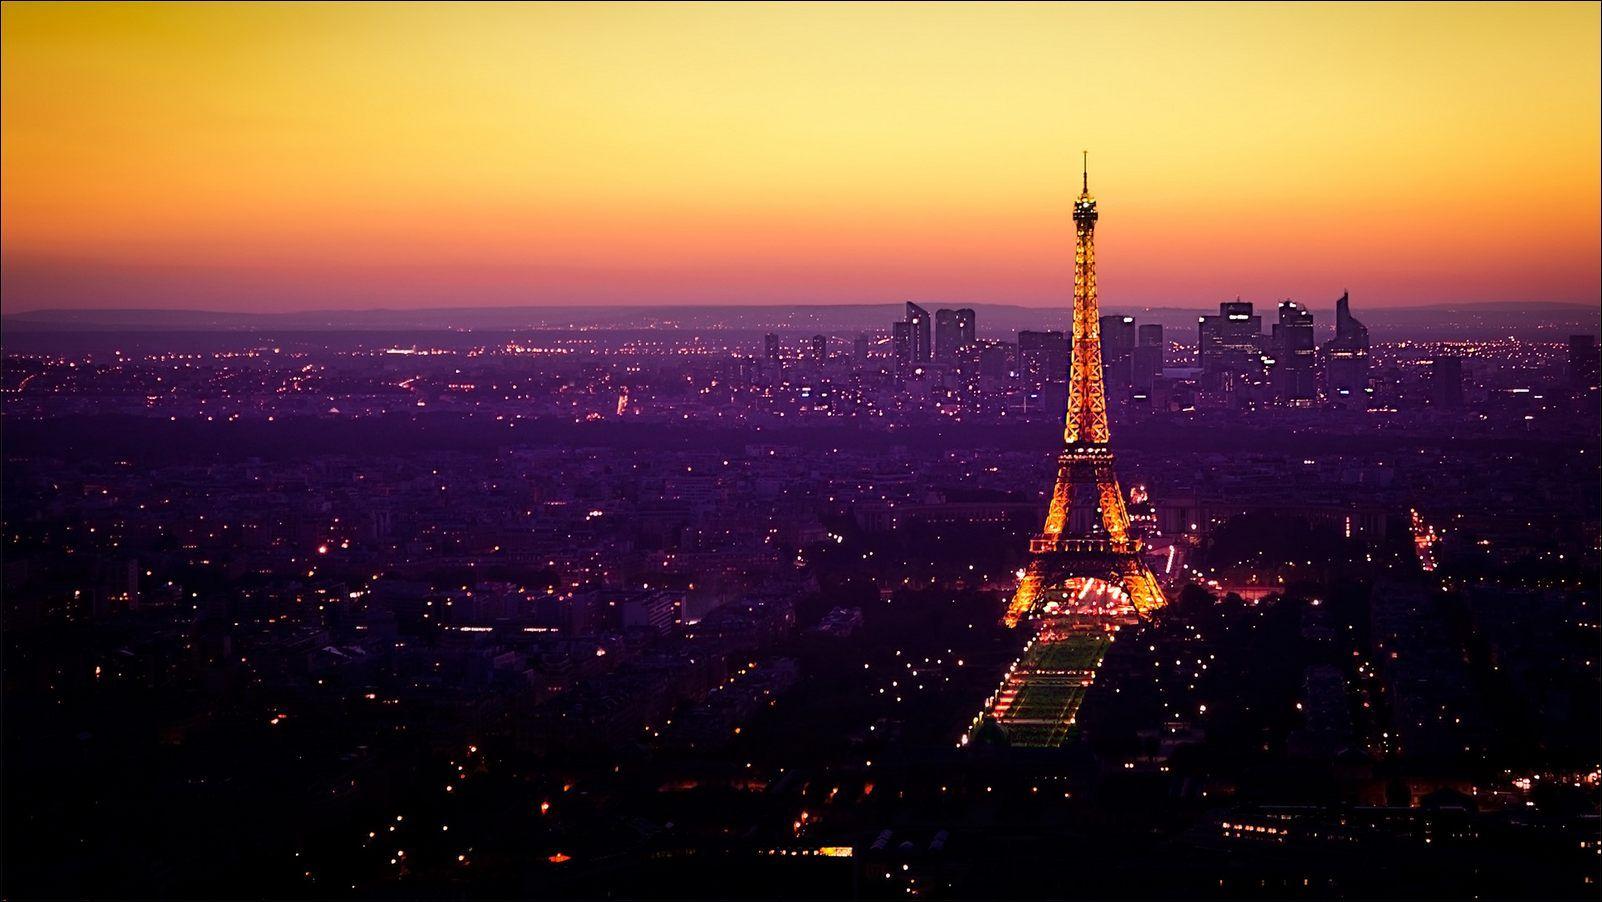 Atardecer-en-Paris.jpg (1602×902)